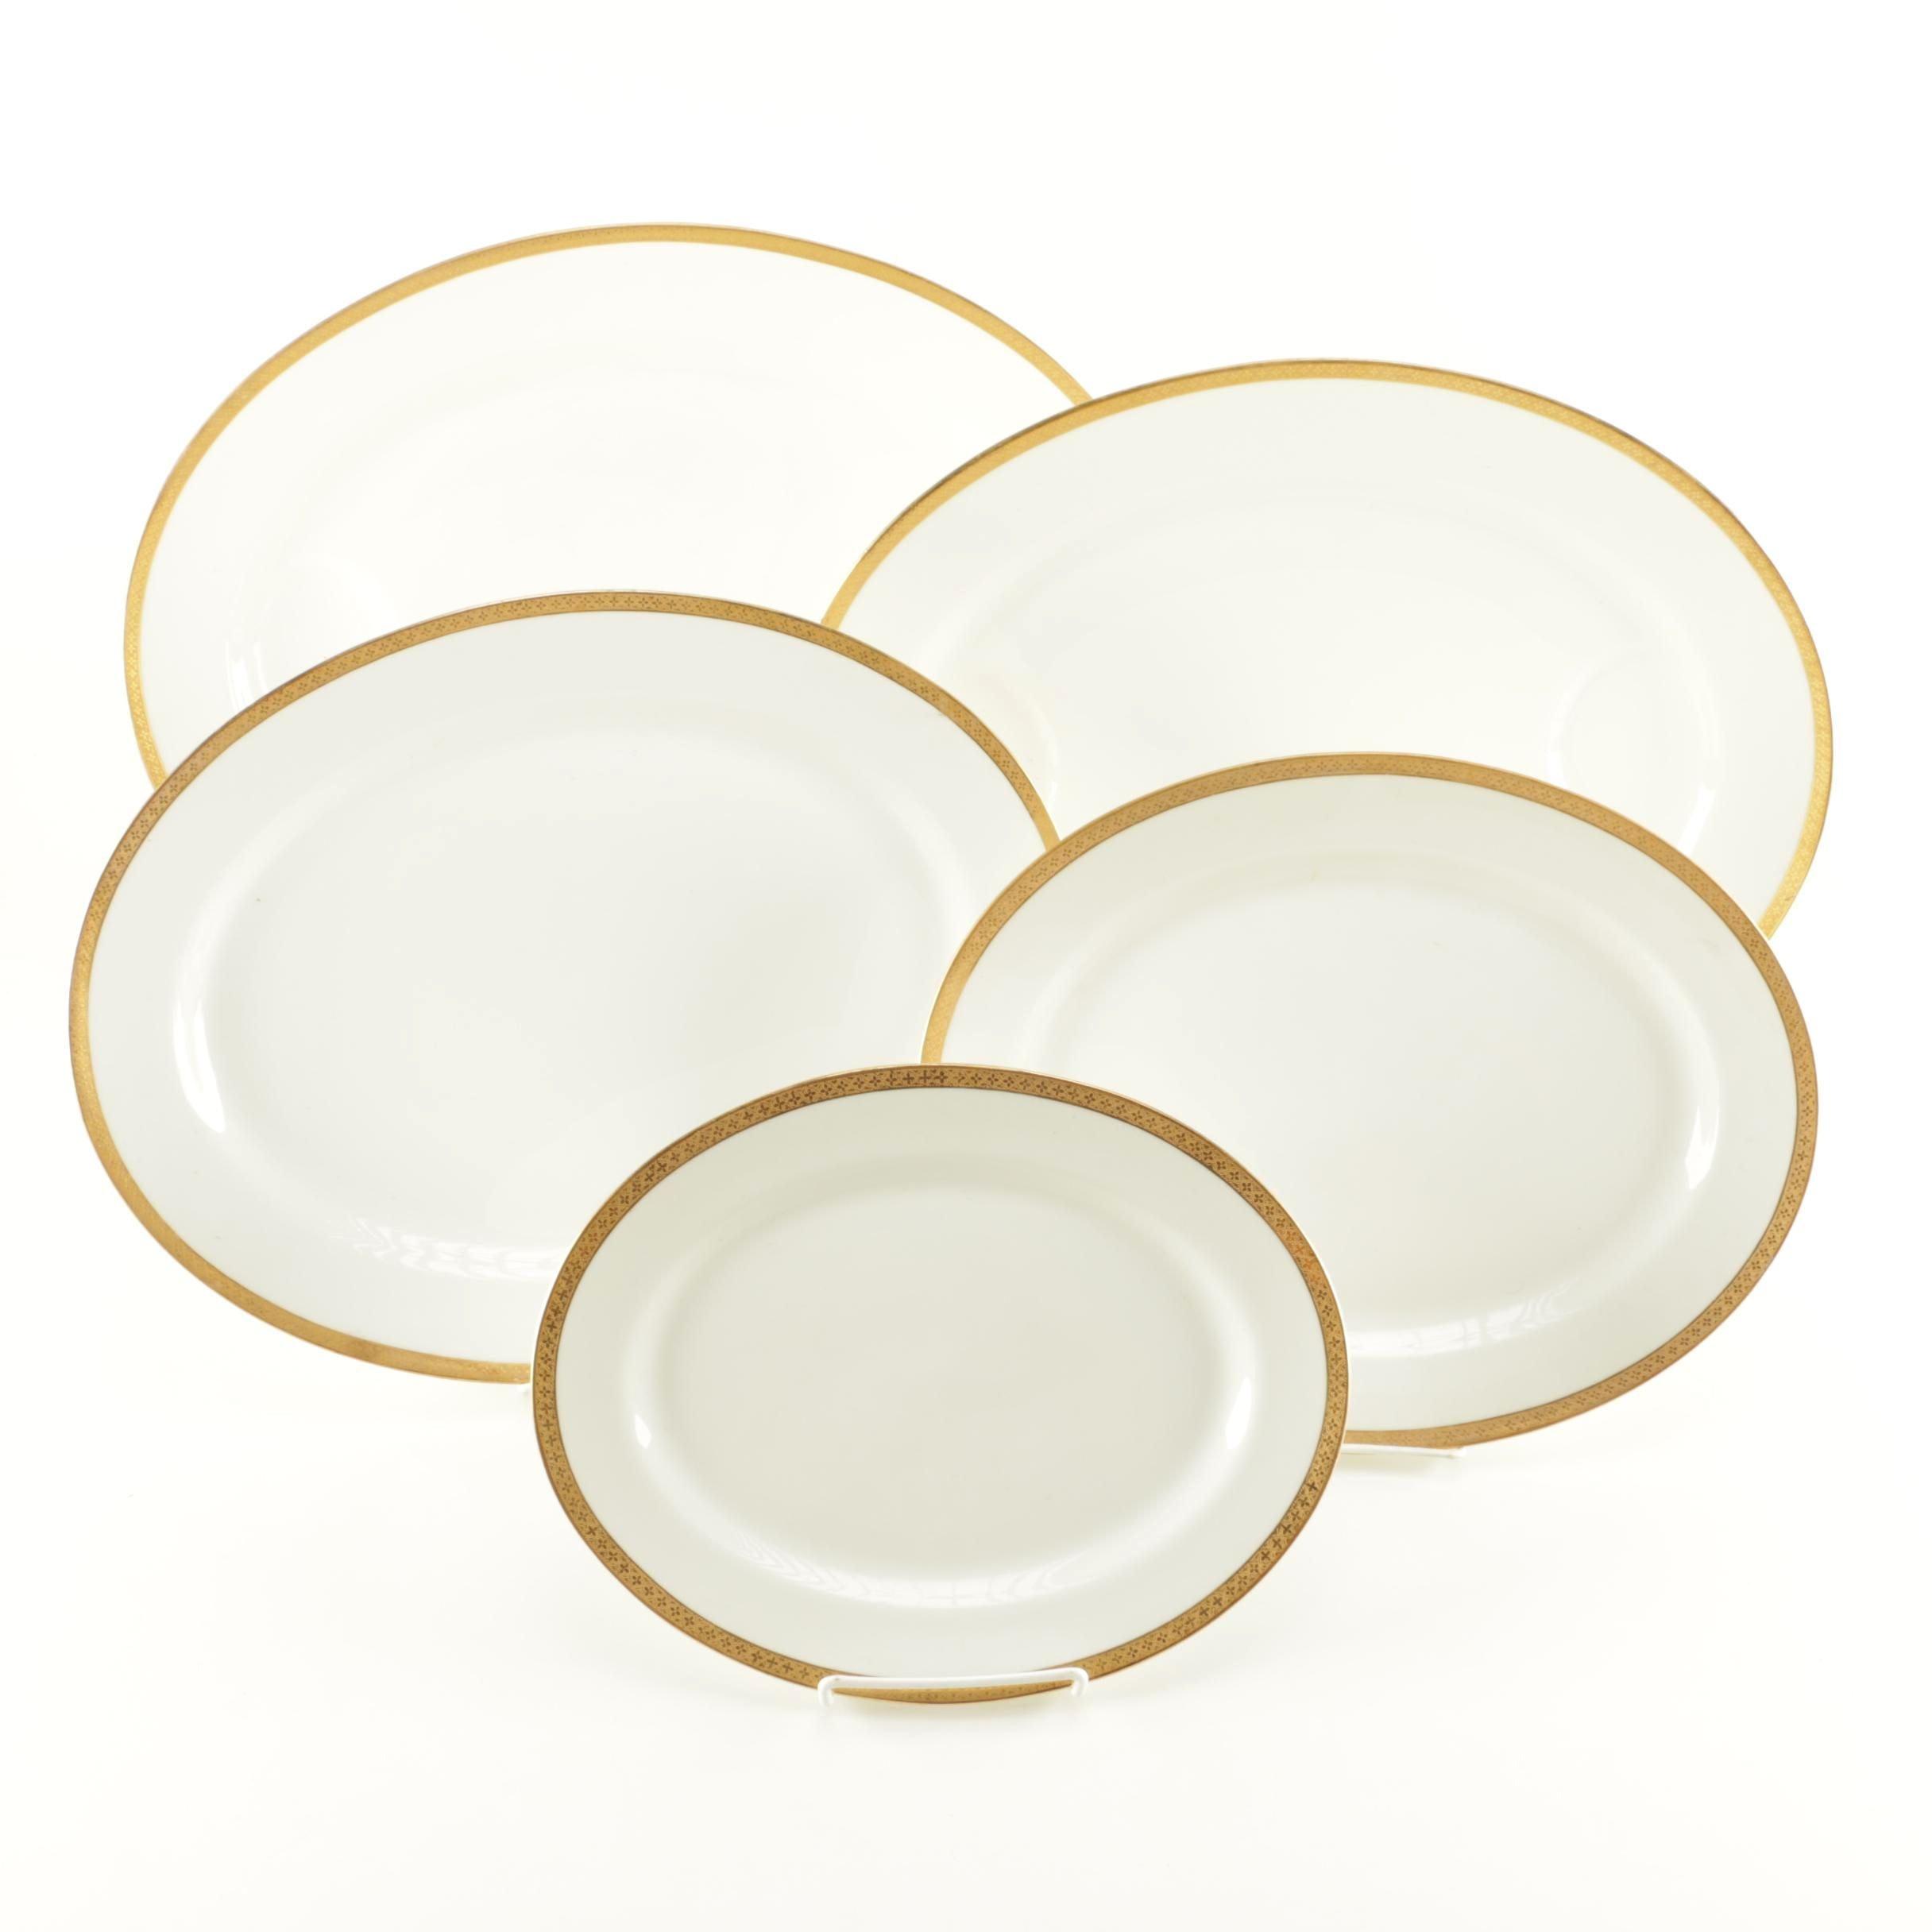 Theodore Haviland Limoges Serving Platters